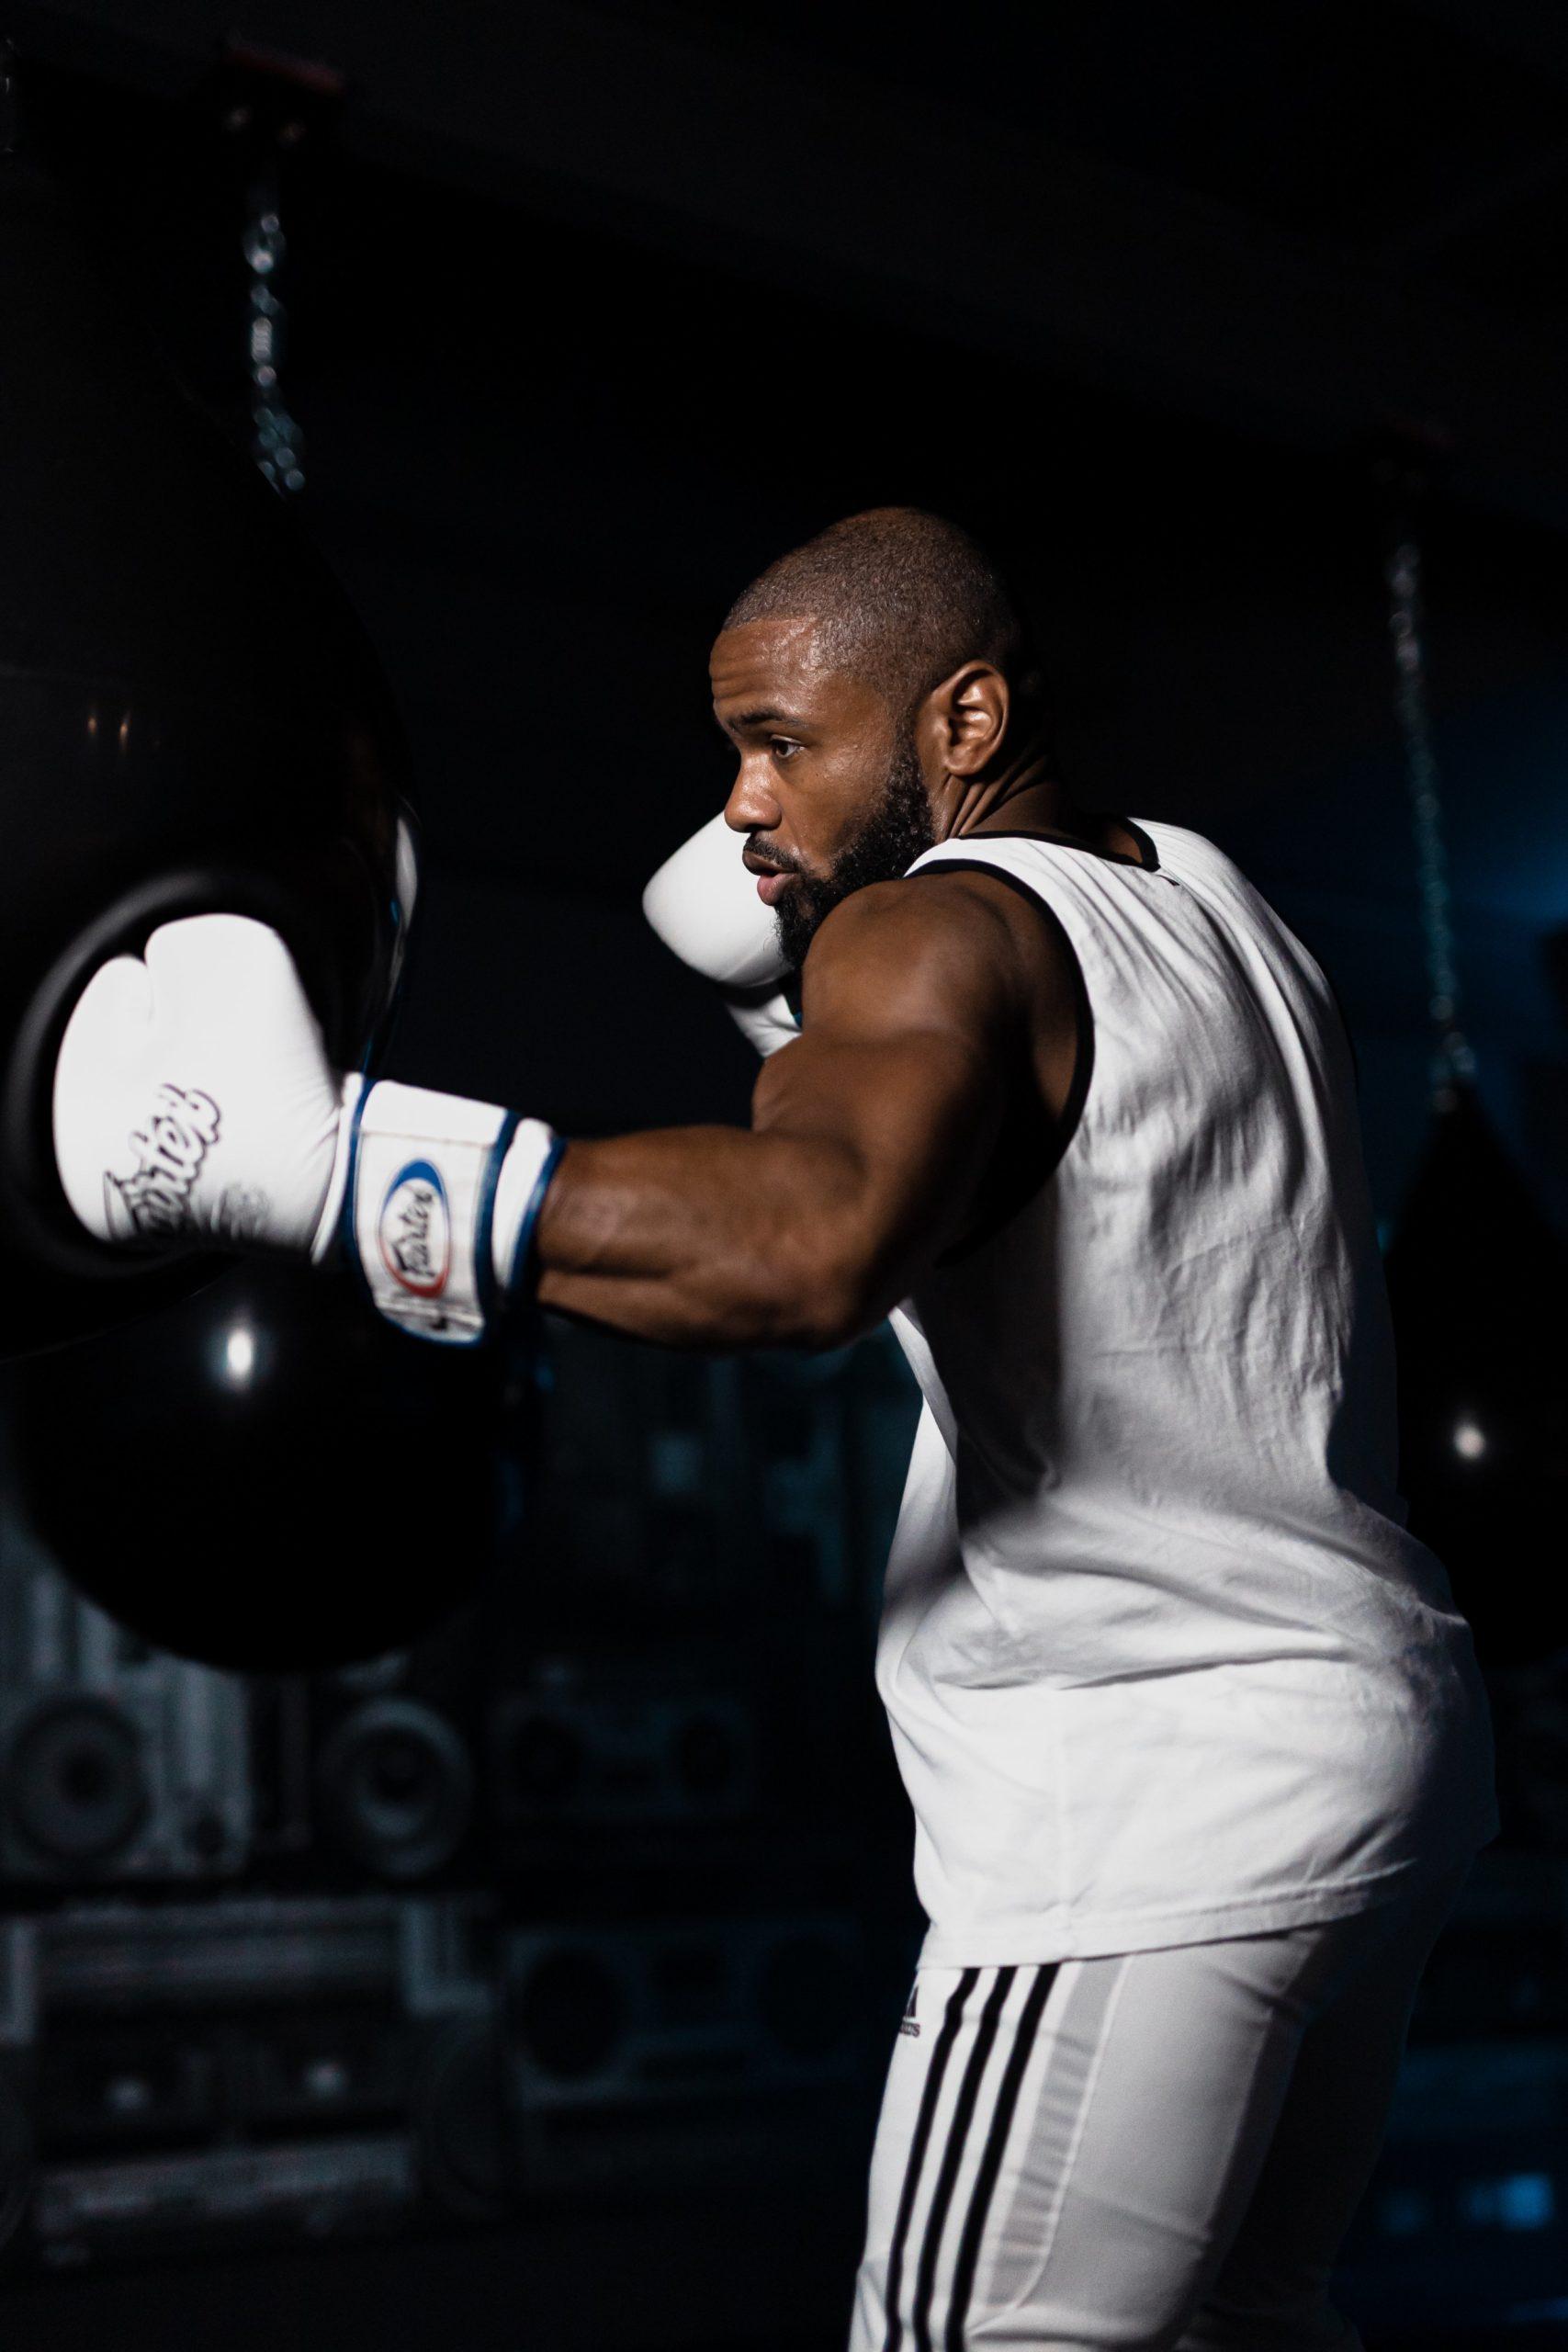 Co-founder Reggie Smith. Photo courtesy of BOOMBOX Boxing Club.